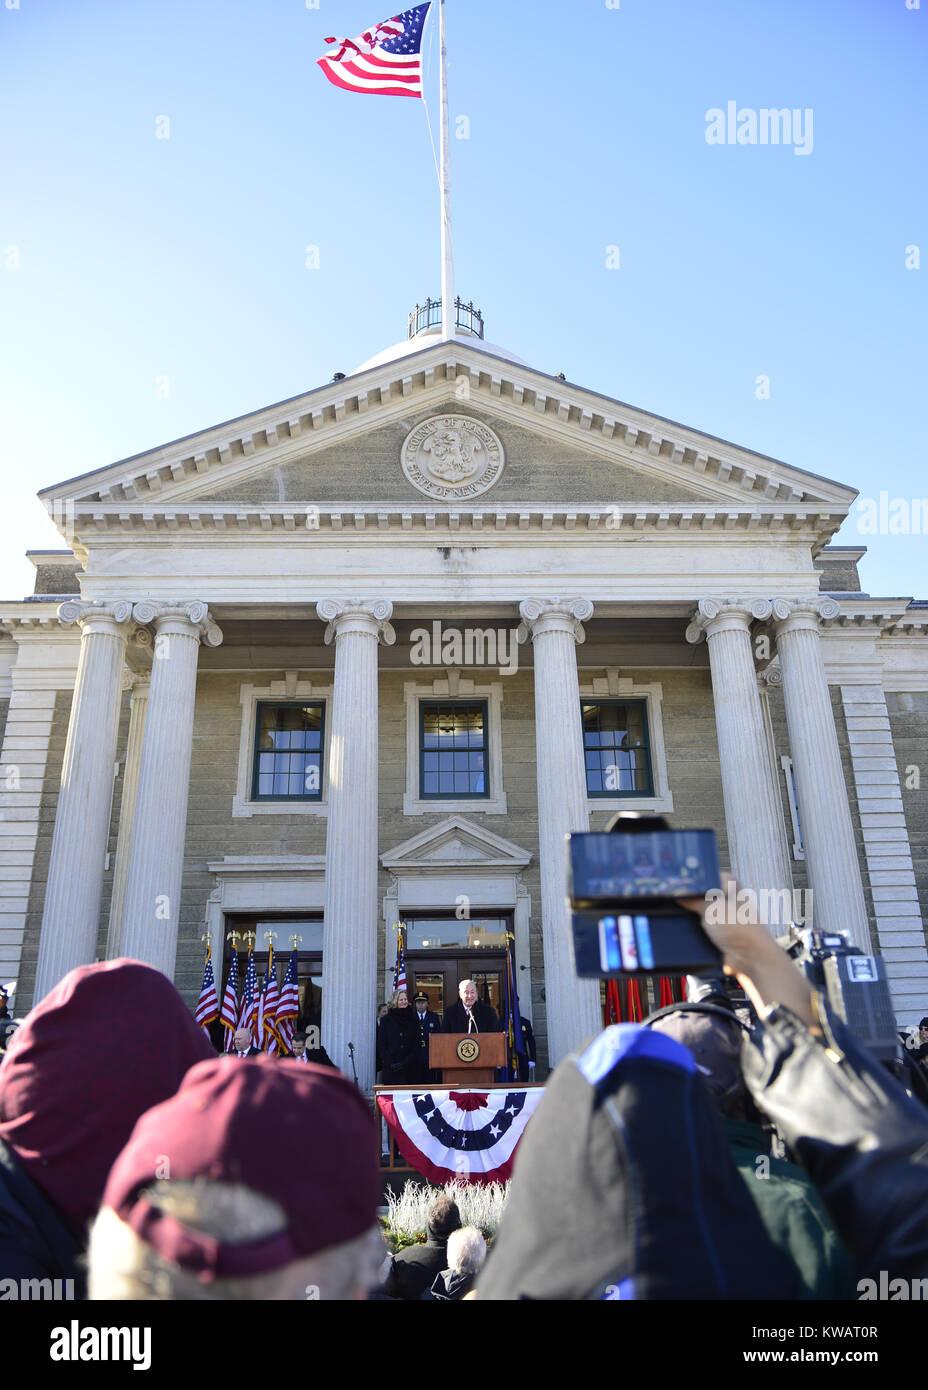 Mineola, New York, USA. 1st Jan, 2018. Speaking at podium is U.S. Senator CHUCK SCHUMER of New York, and left of - Stock Image